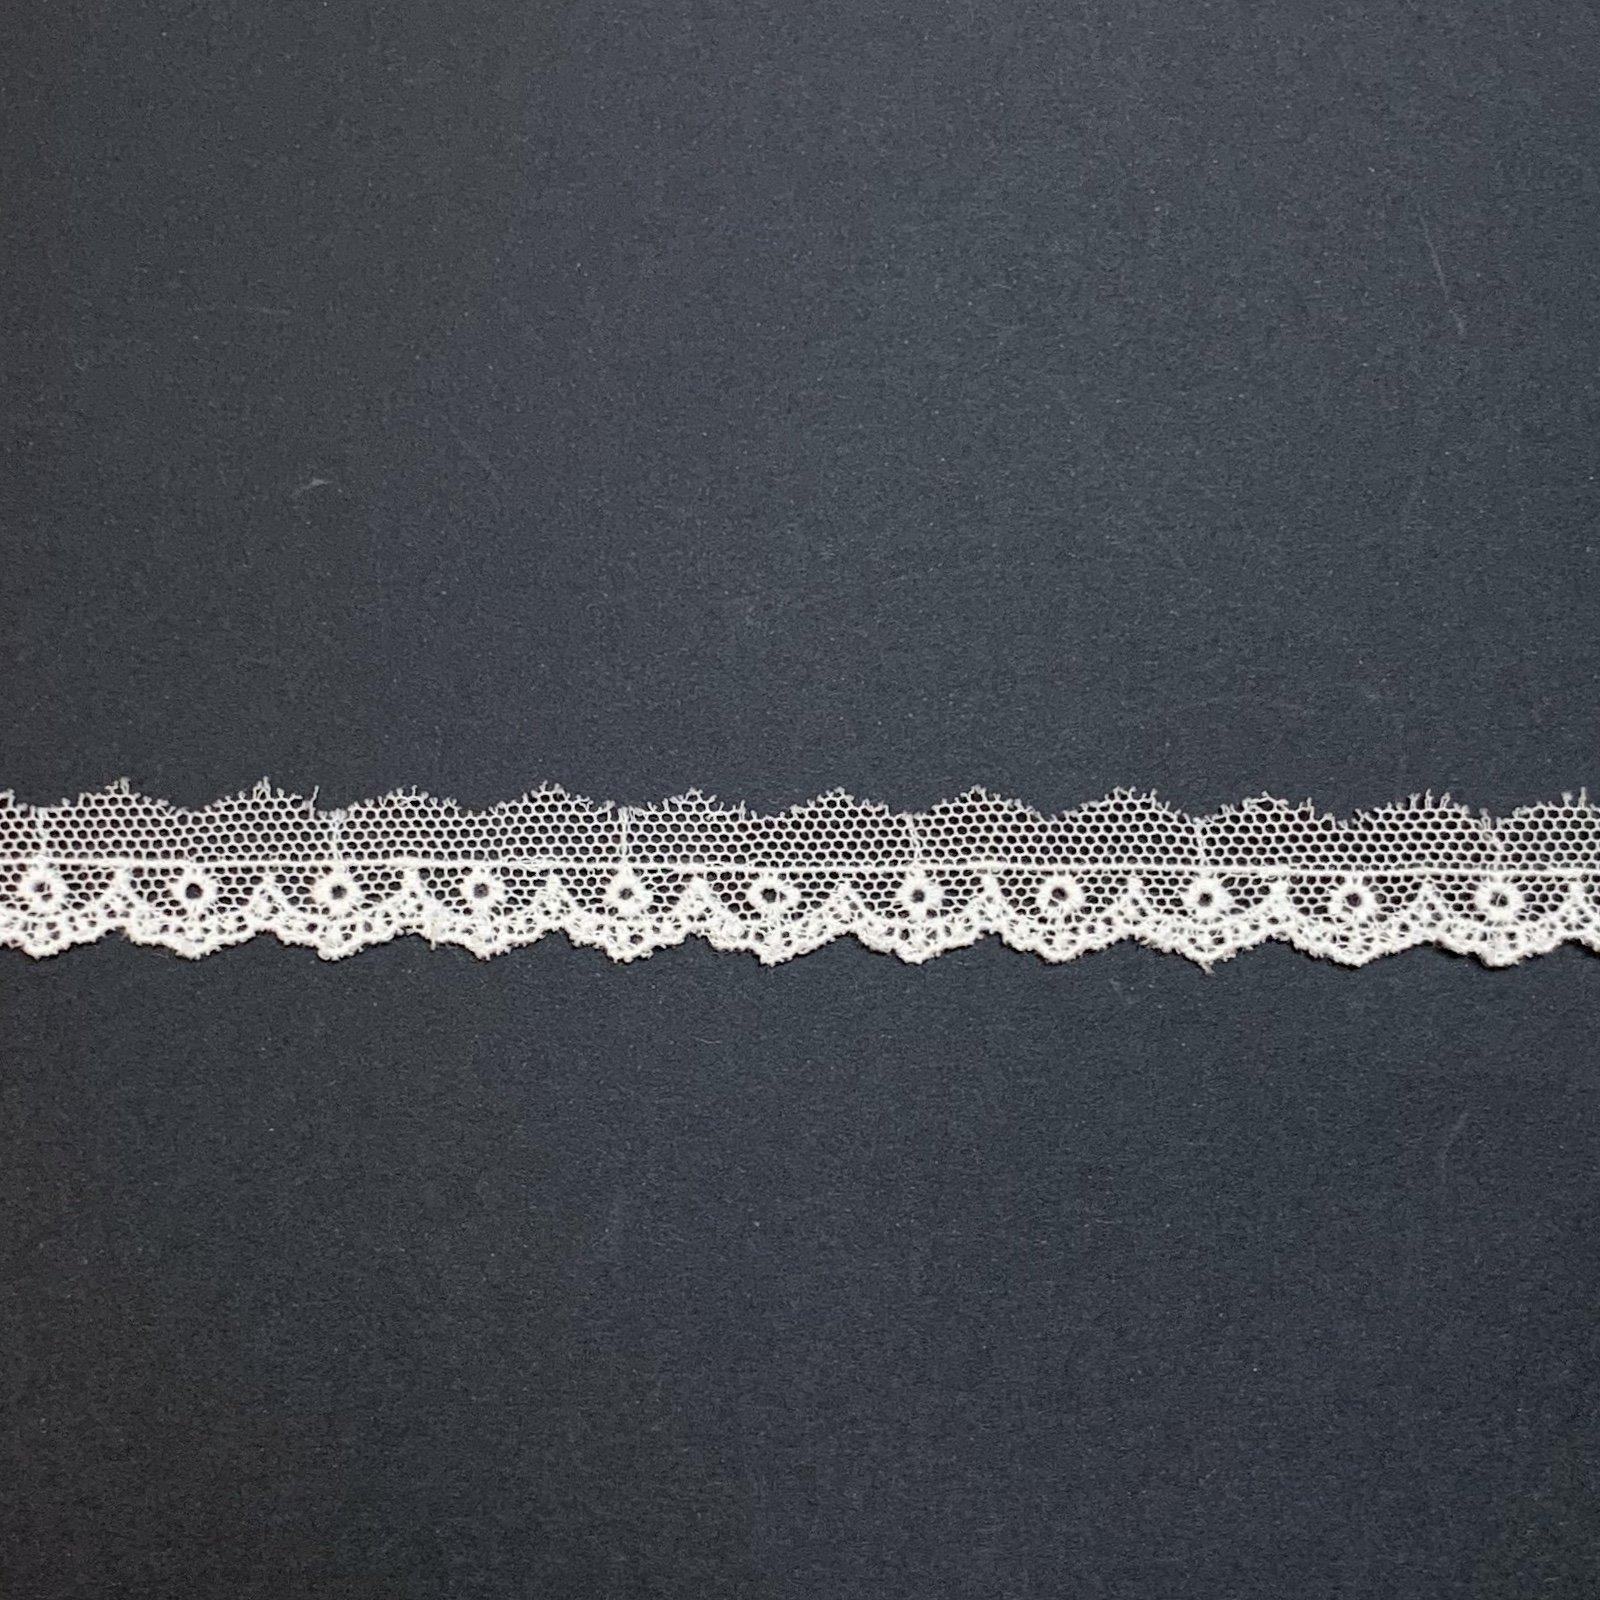 Netting Lace Edging 3/8 Soft White 121